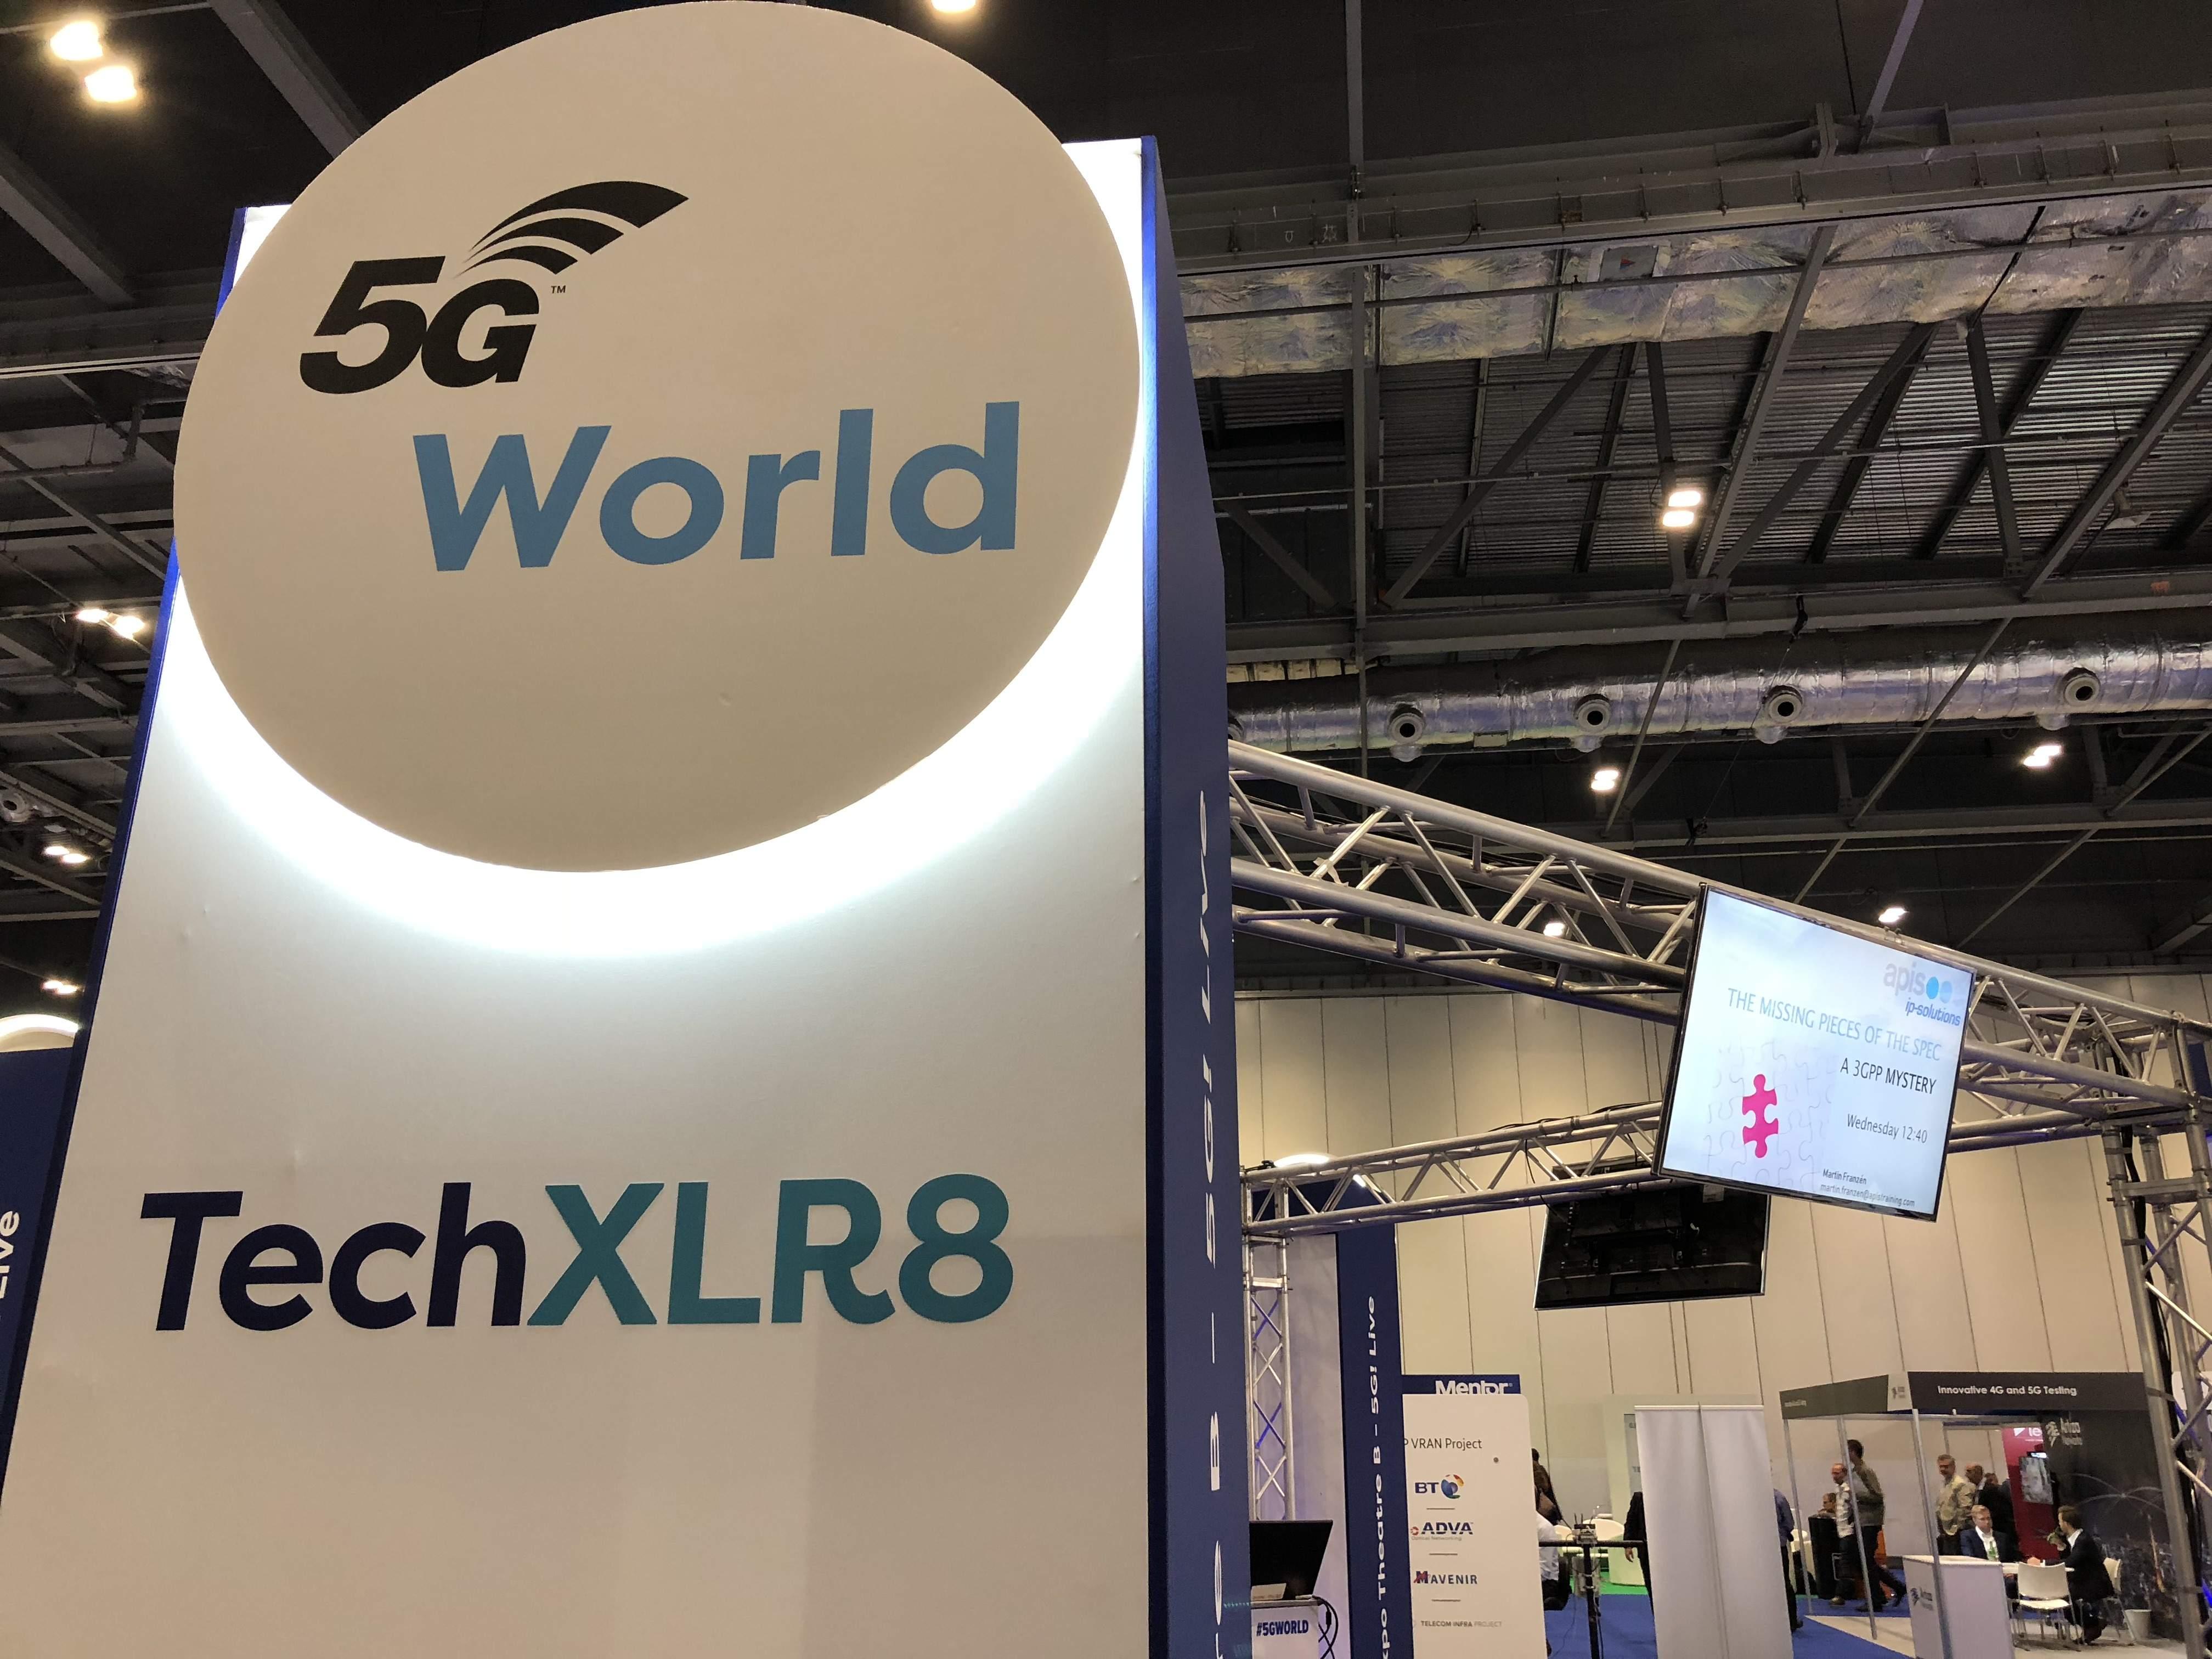 London Tech Week,5G